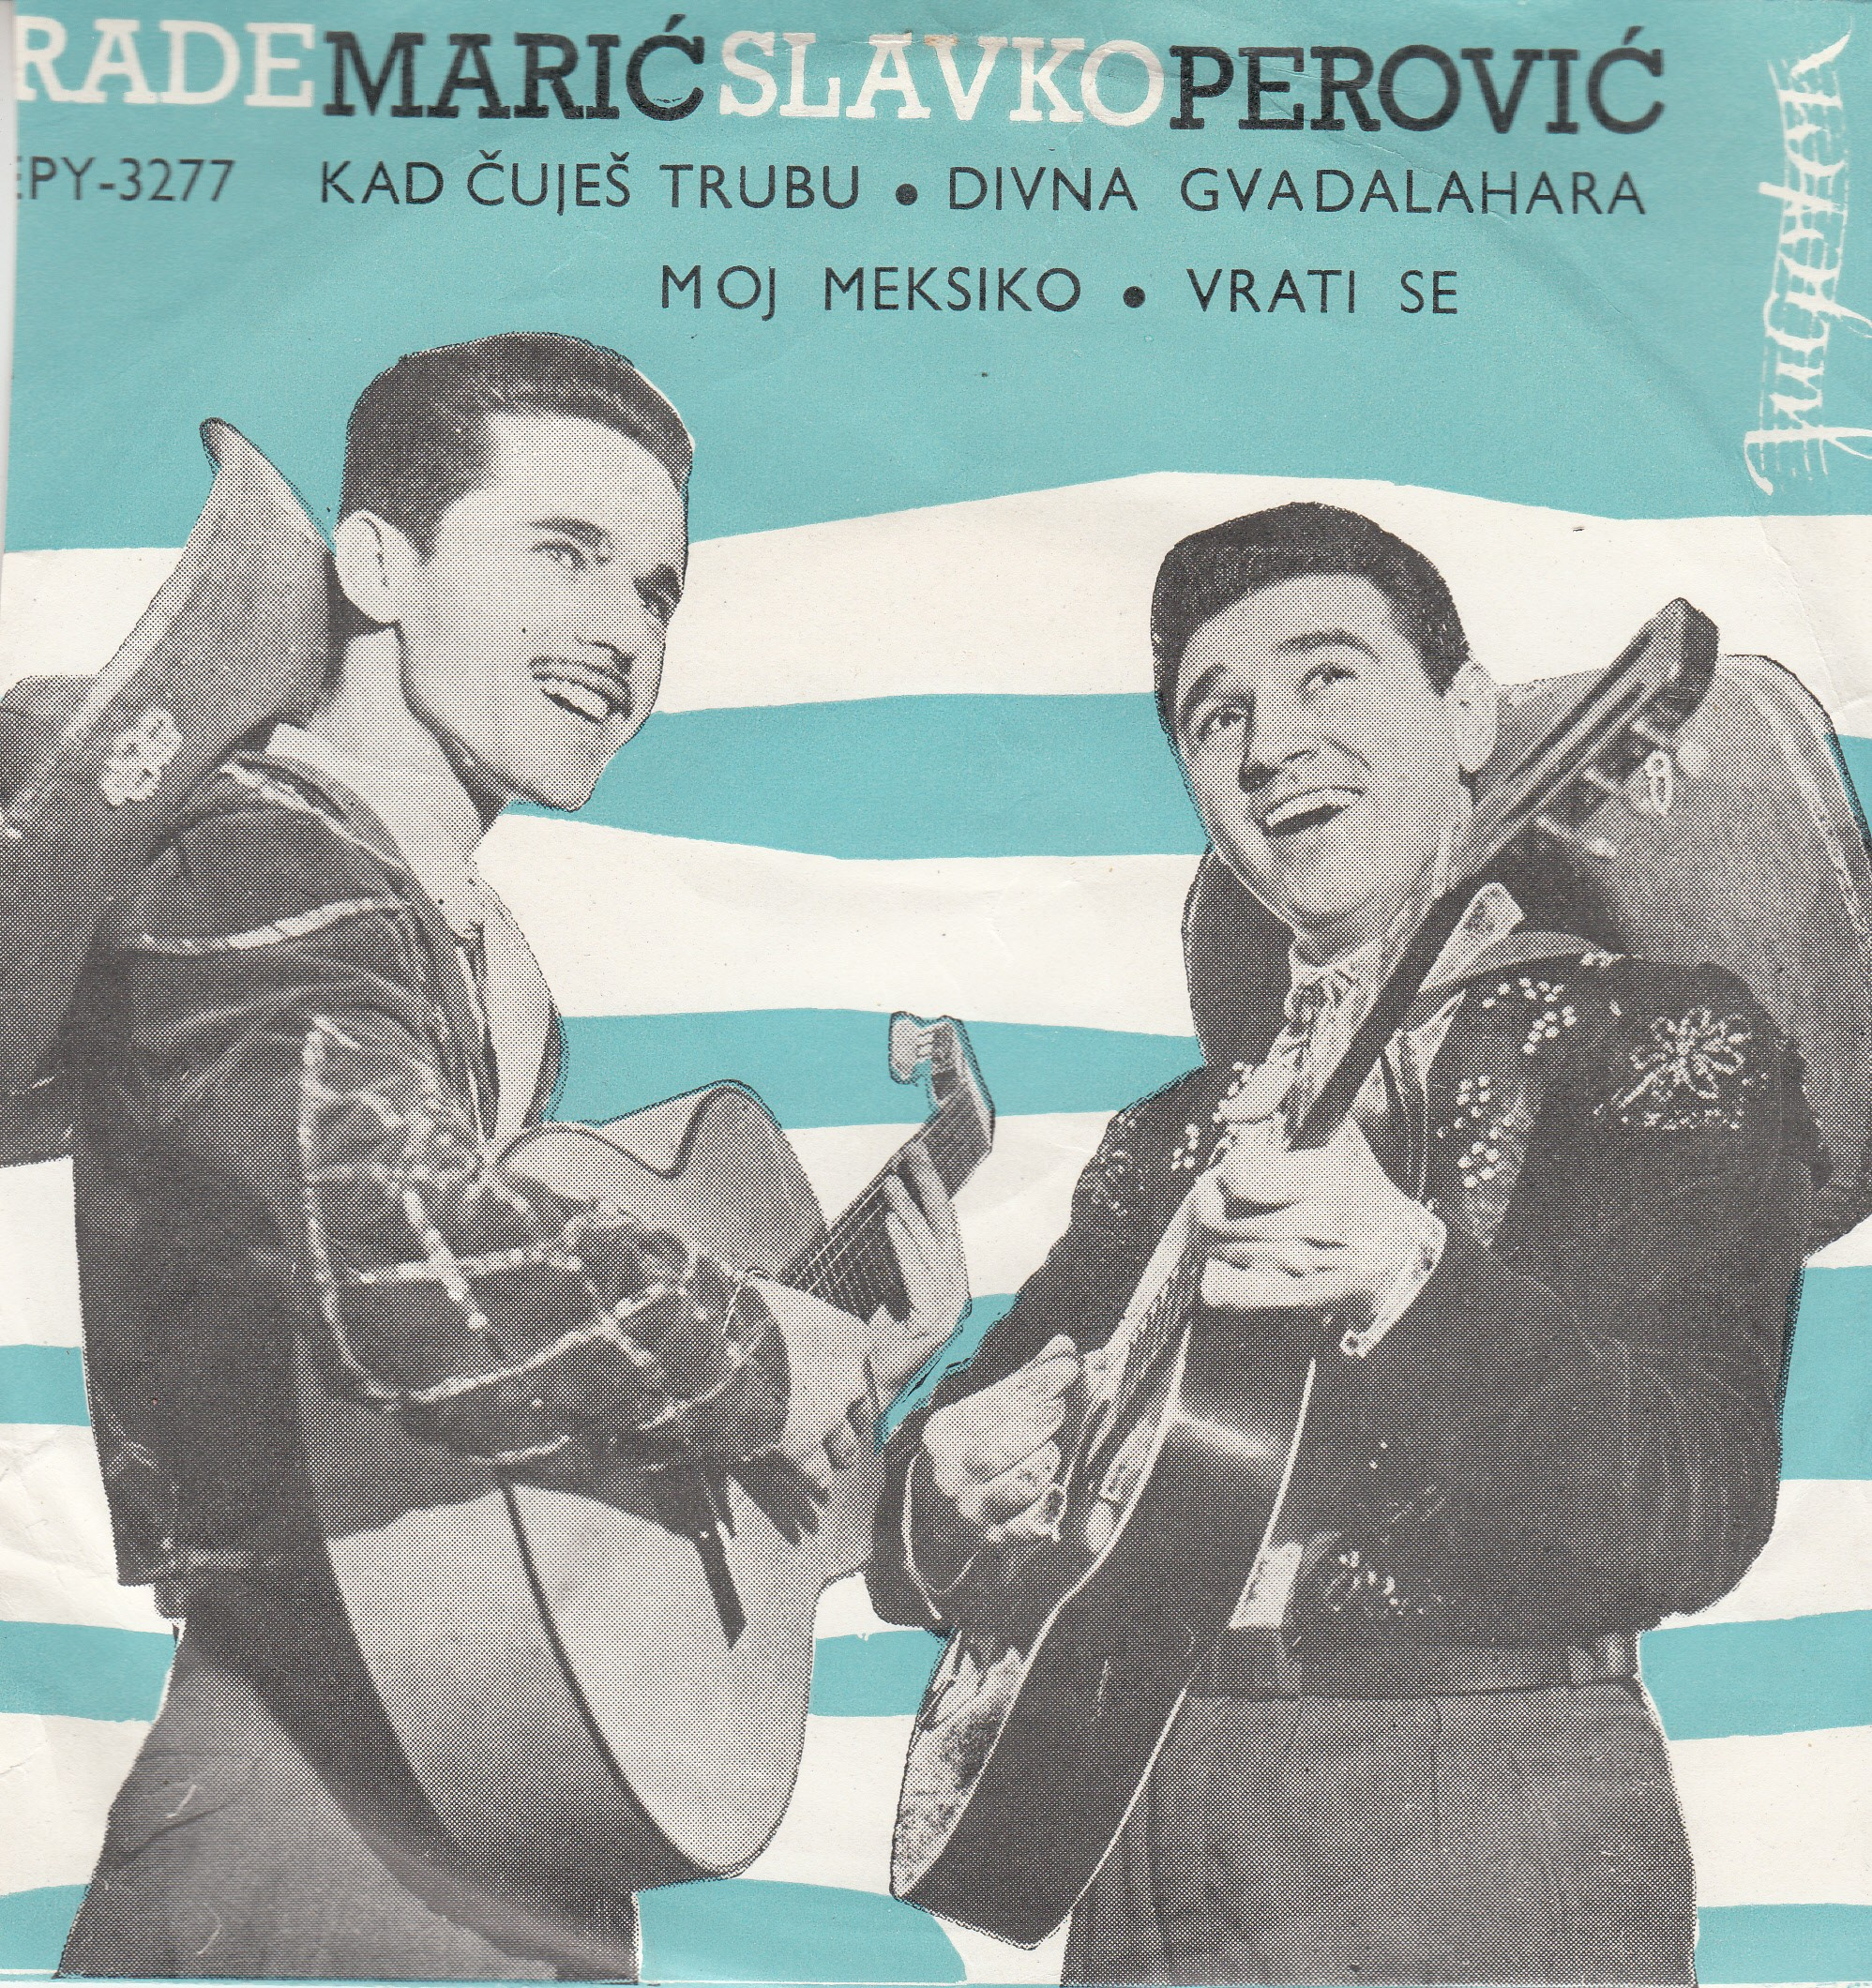 Perovic Slavko Rade Maric - Kad Cujes Trubu/divna Guadalahara/moj Meksiko/vrati Se